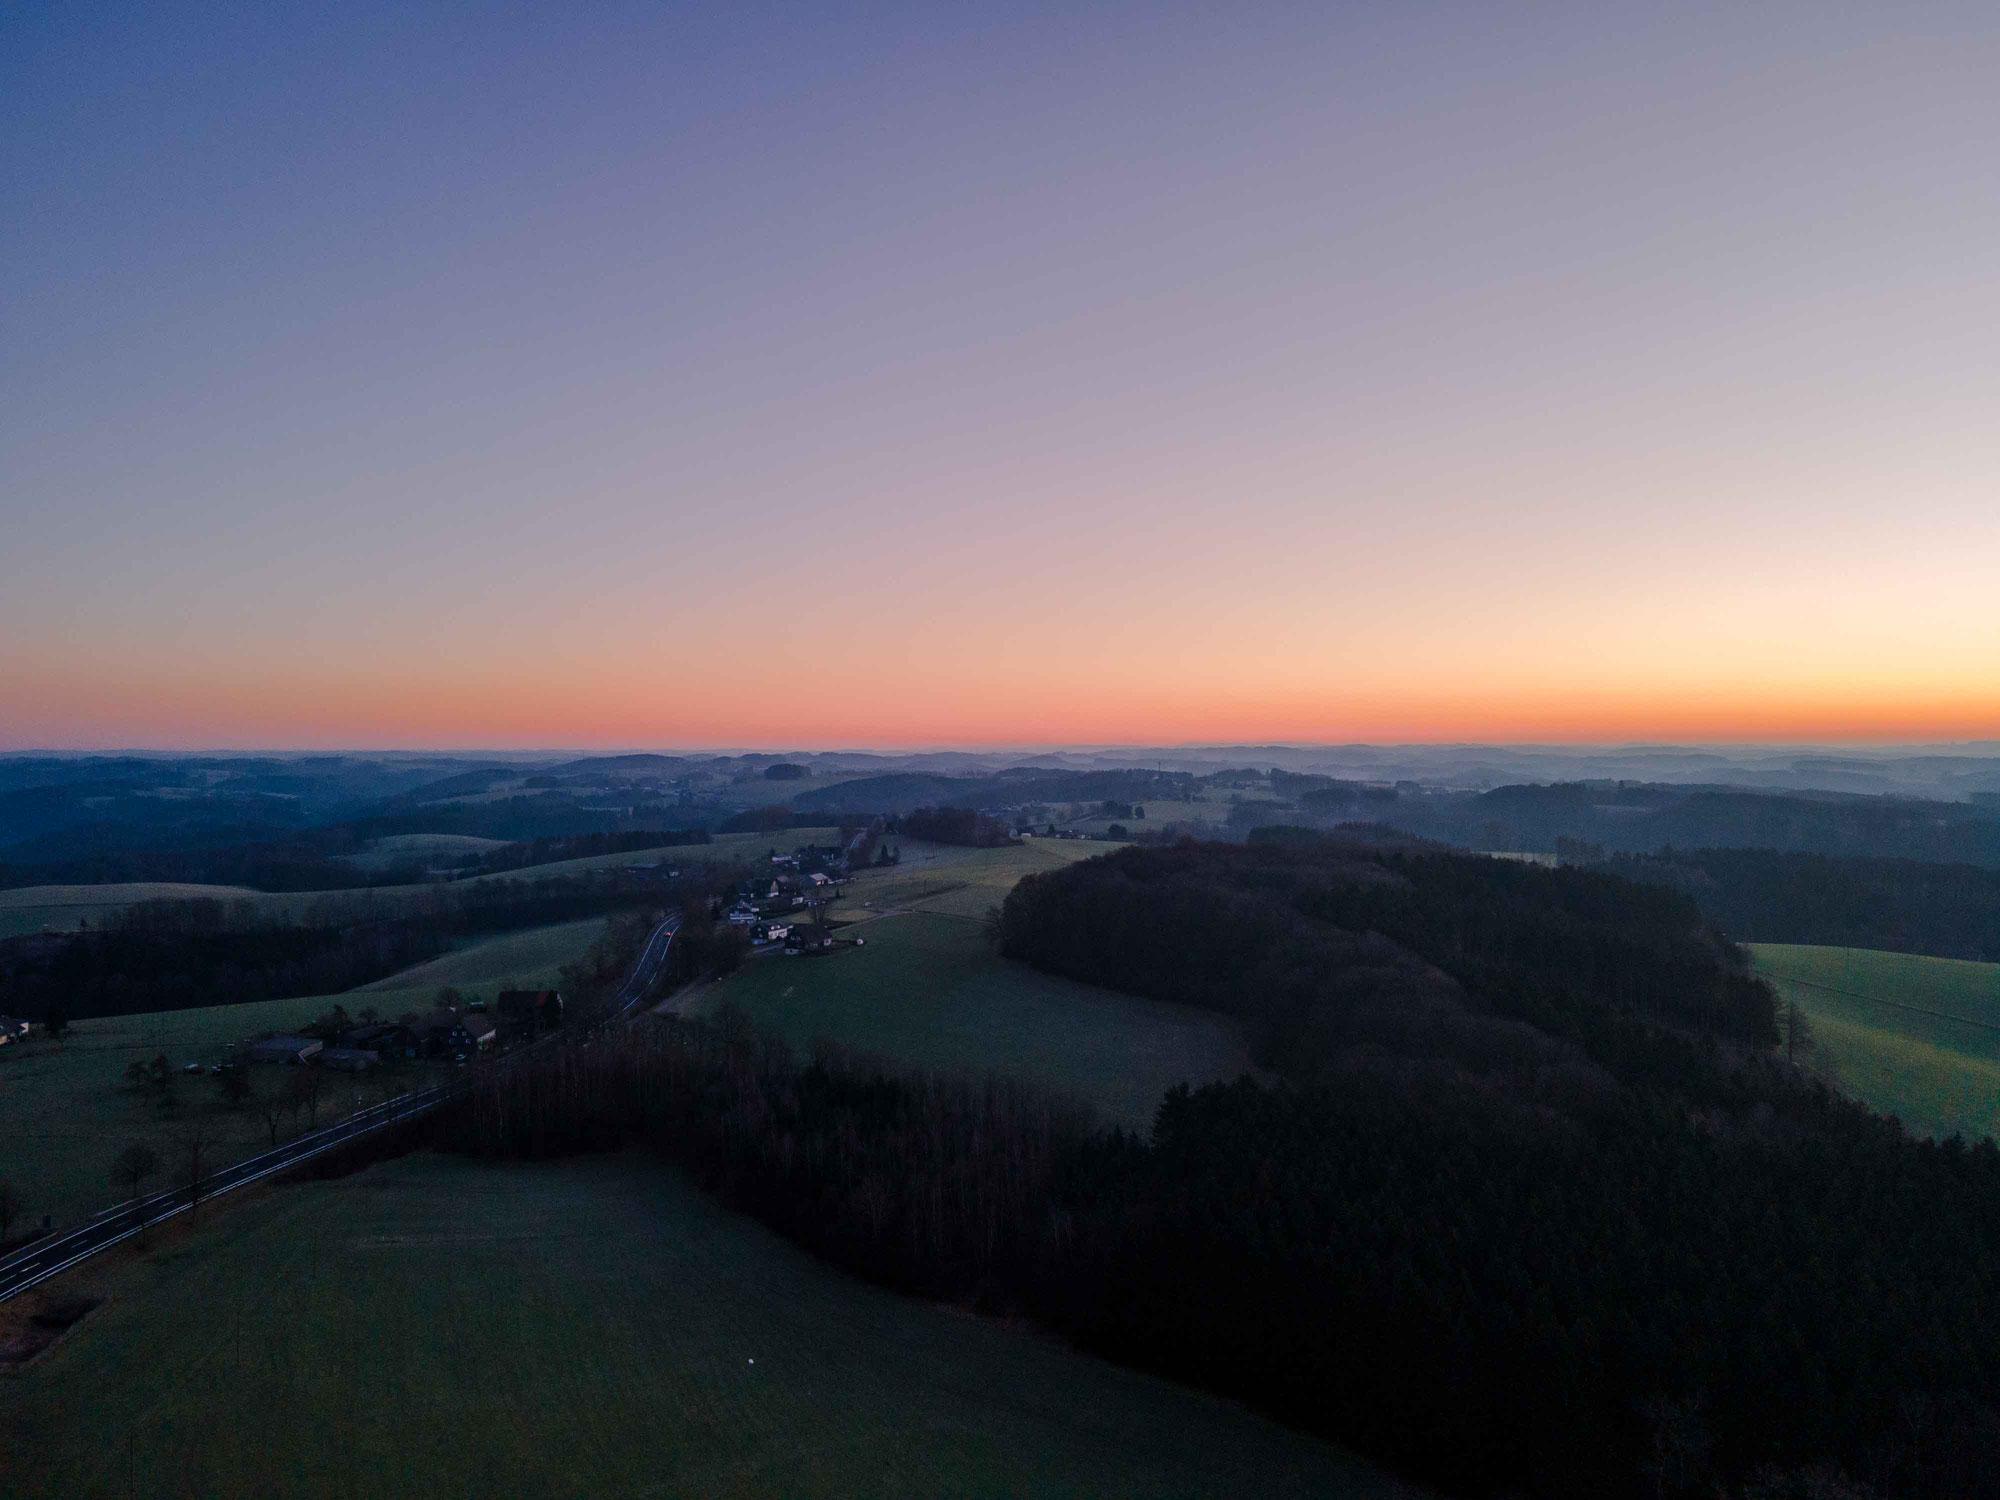 Sonnenaufgang Nähe Wipperfürth